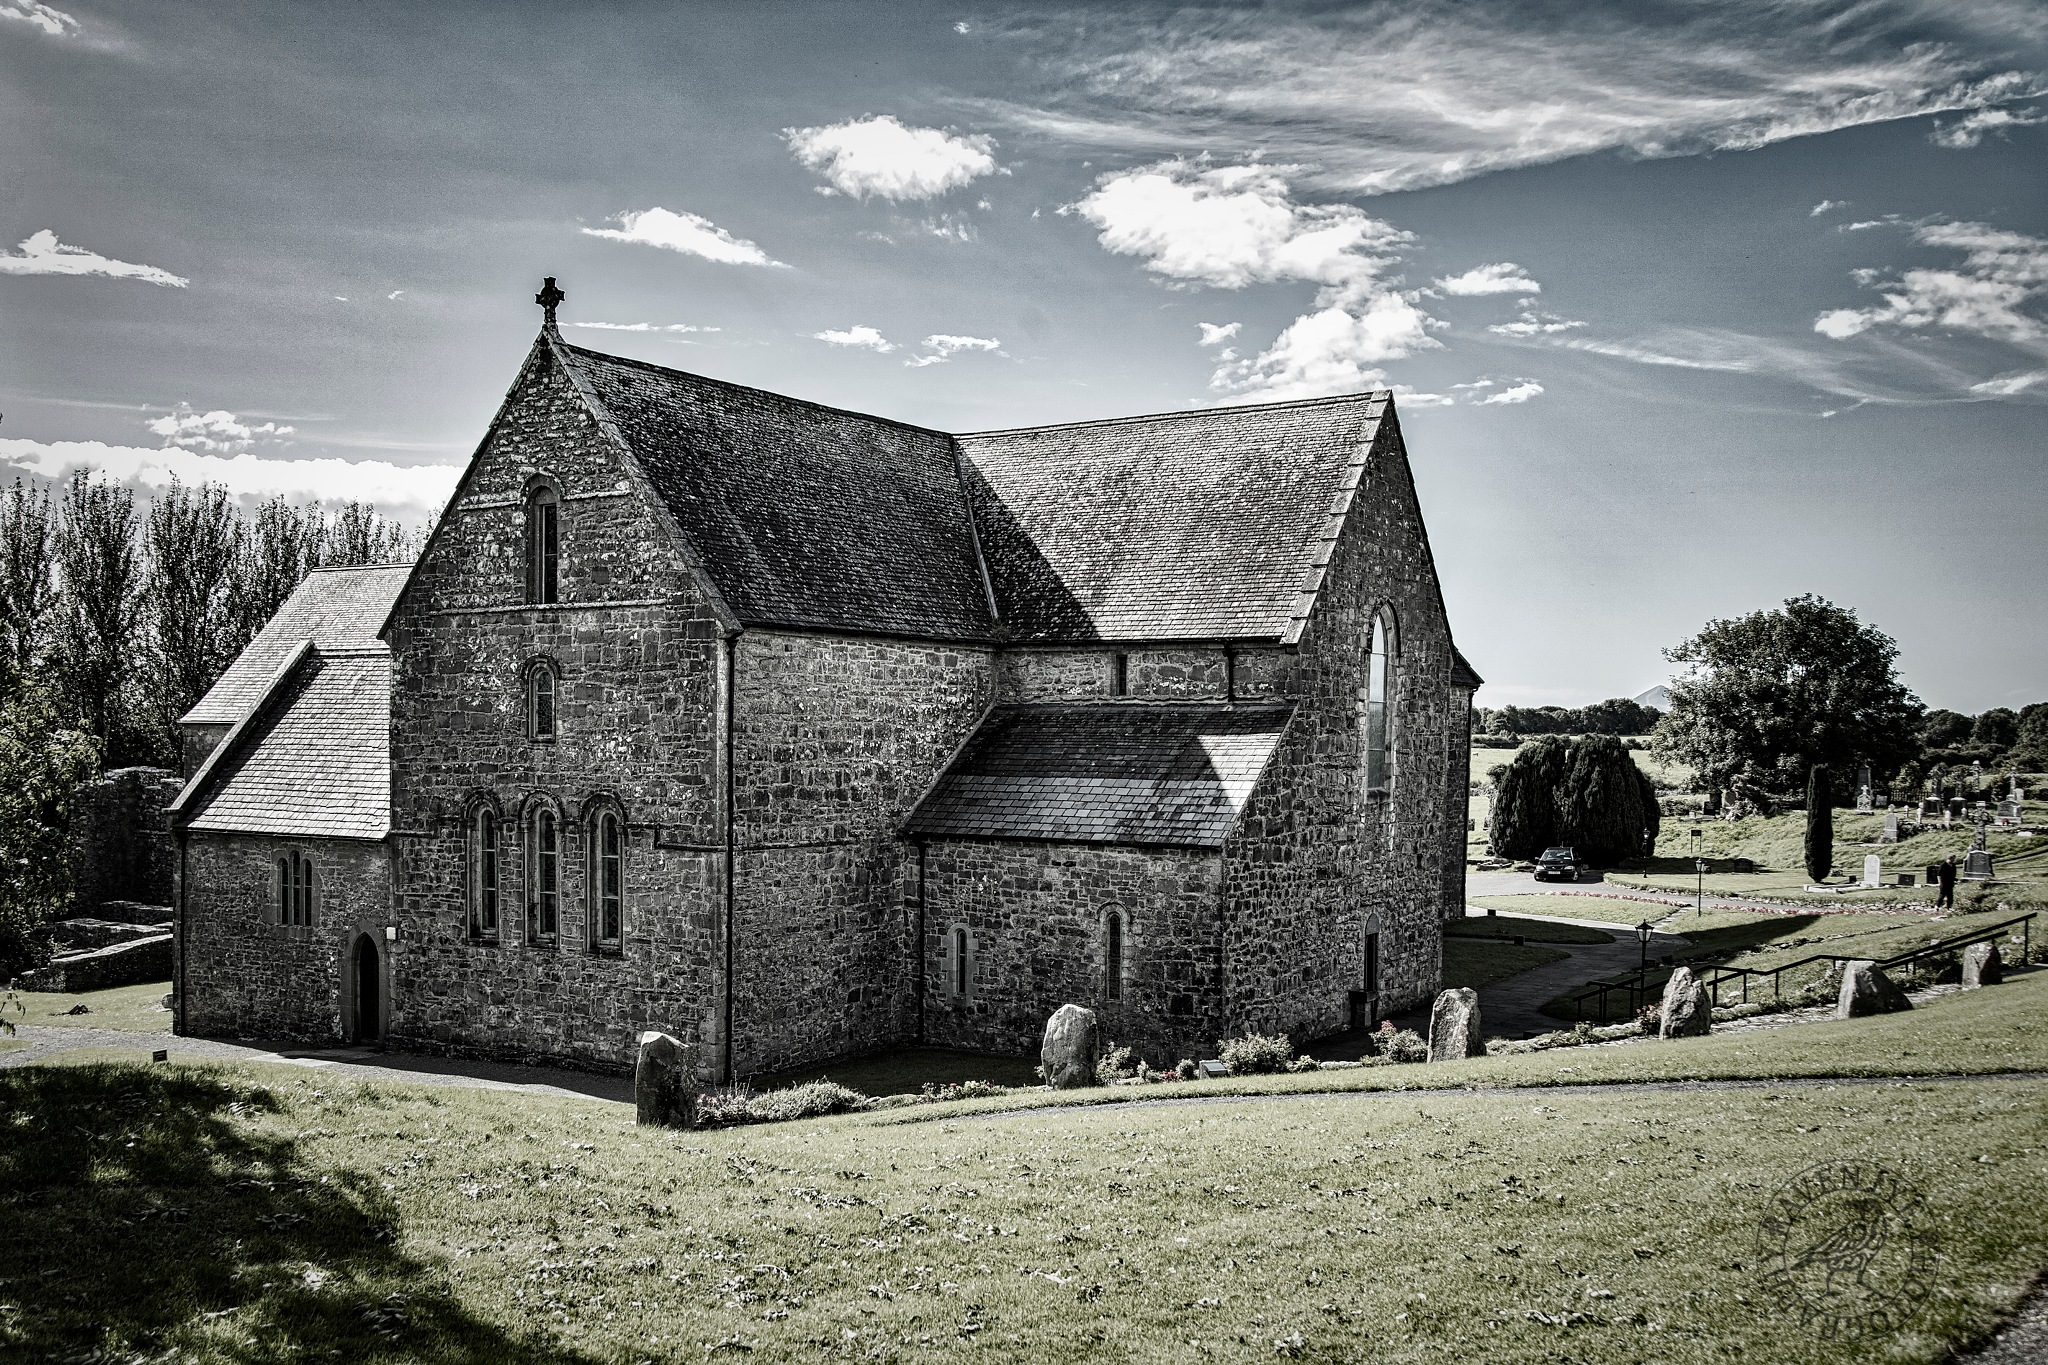 Ballintubber Abbey by Declan Byrne